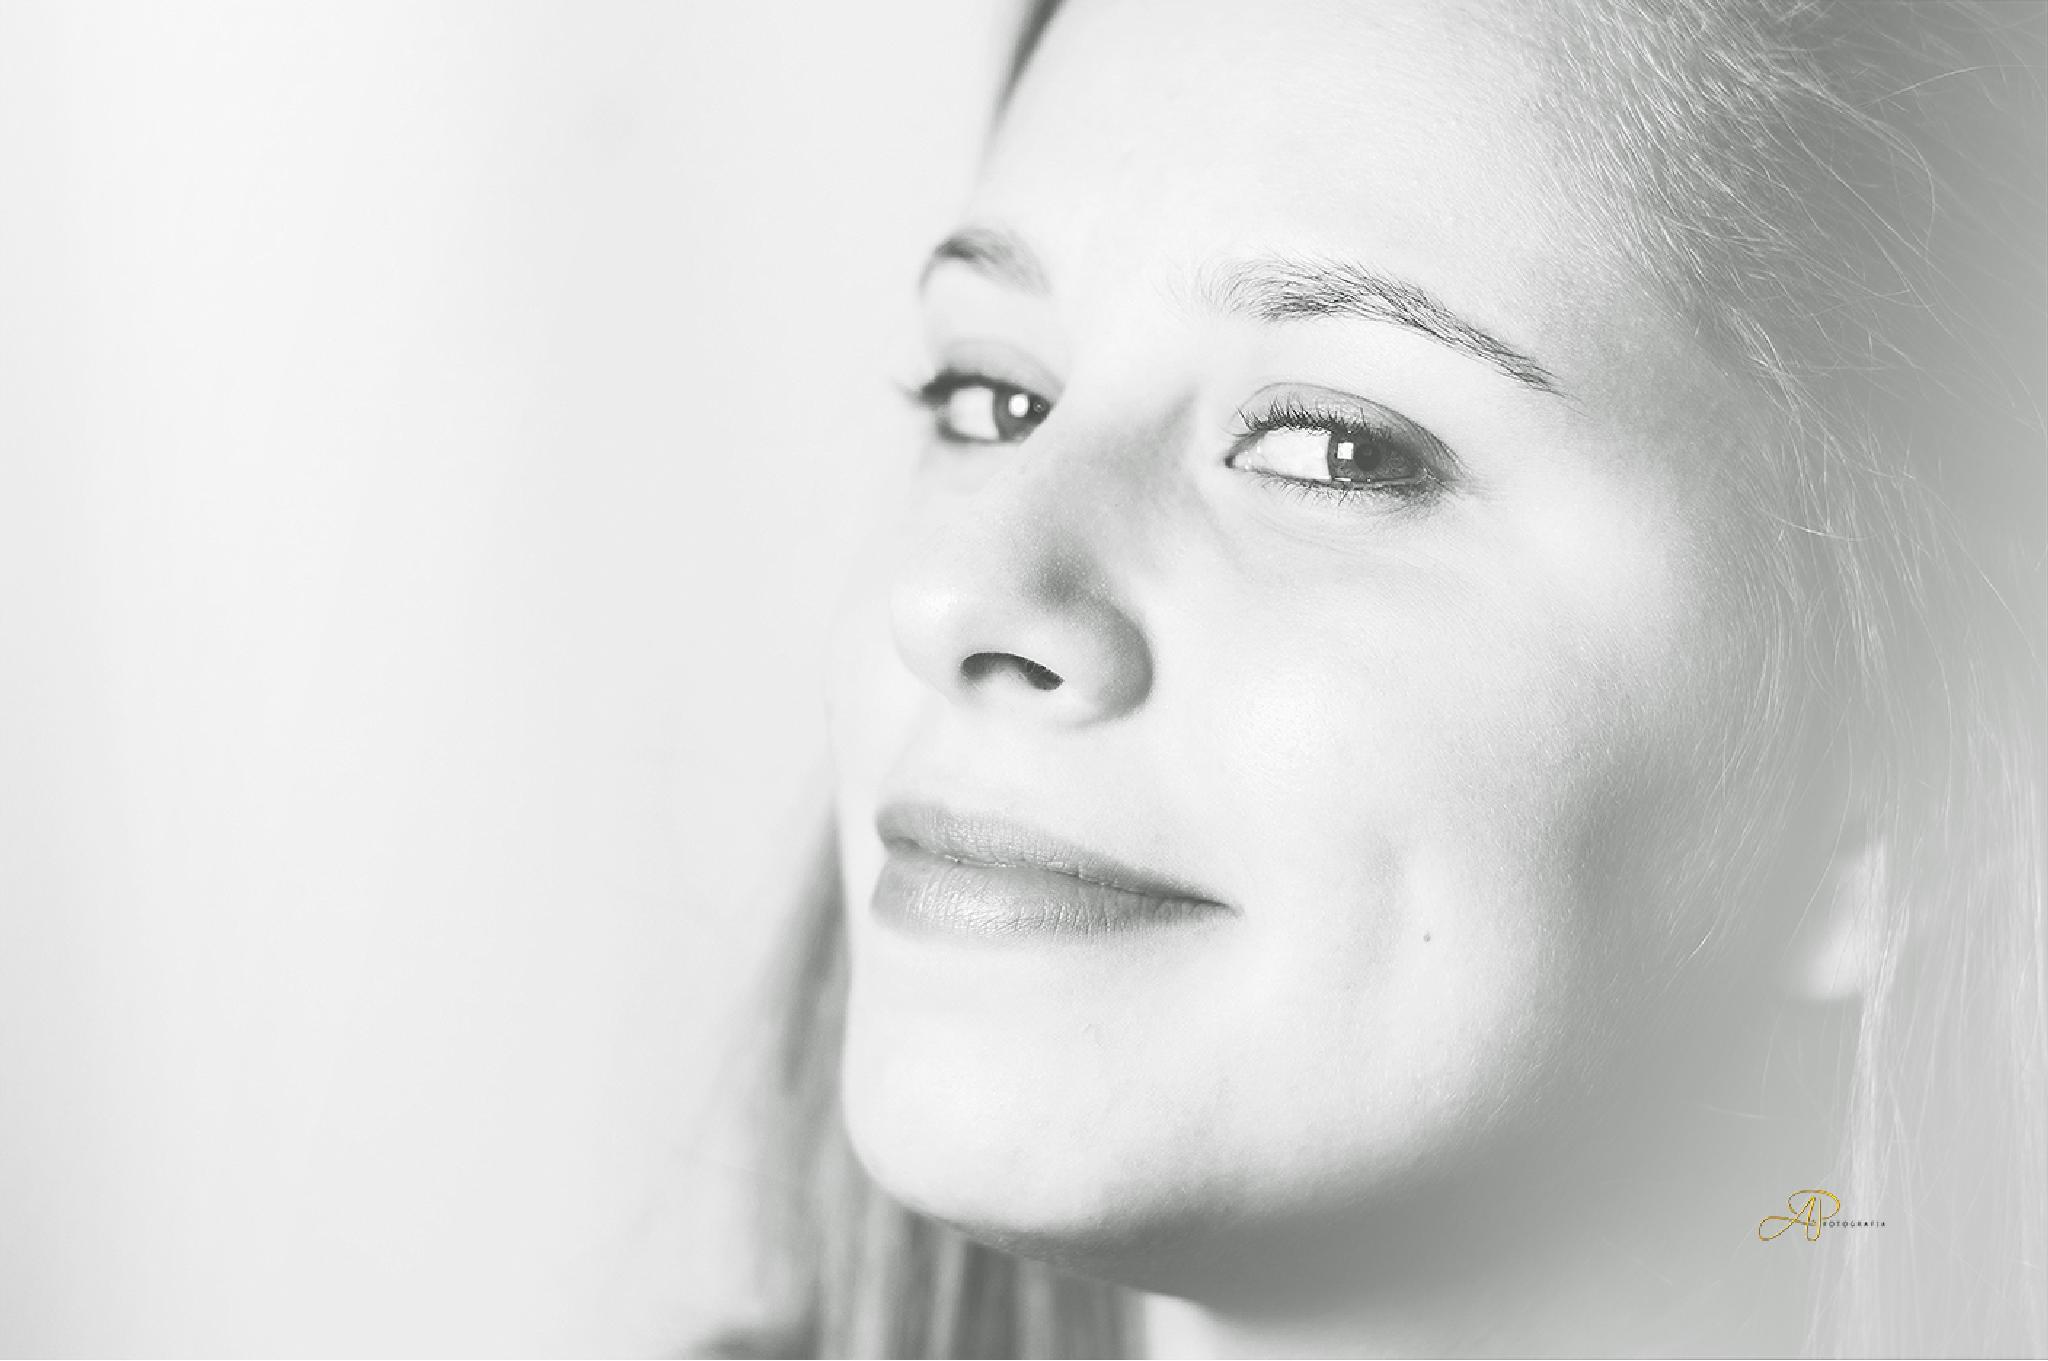 Karina Rogge by Assis Pereira